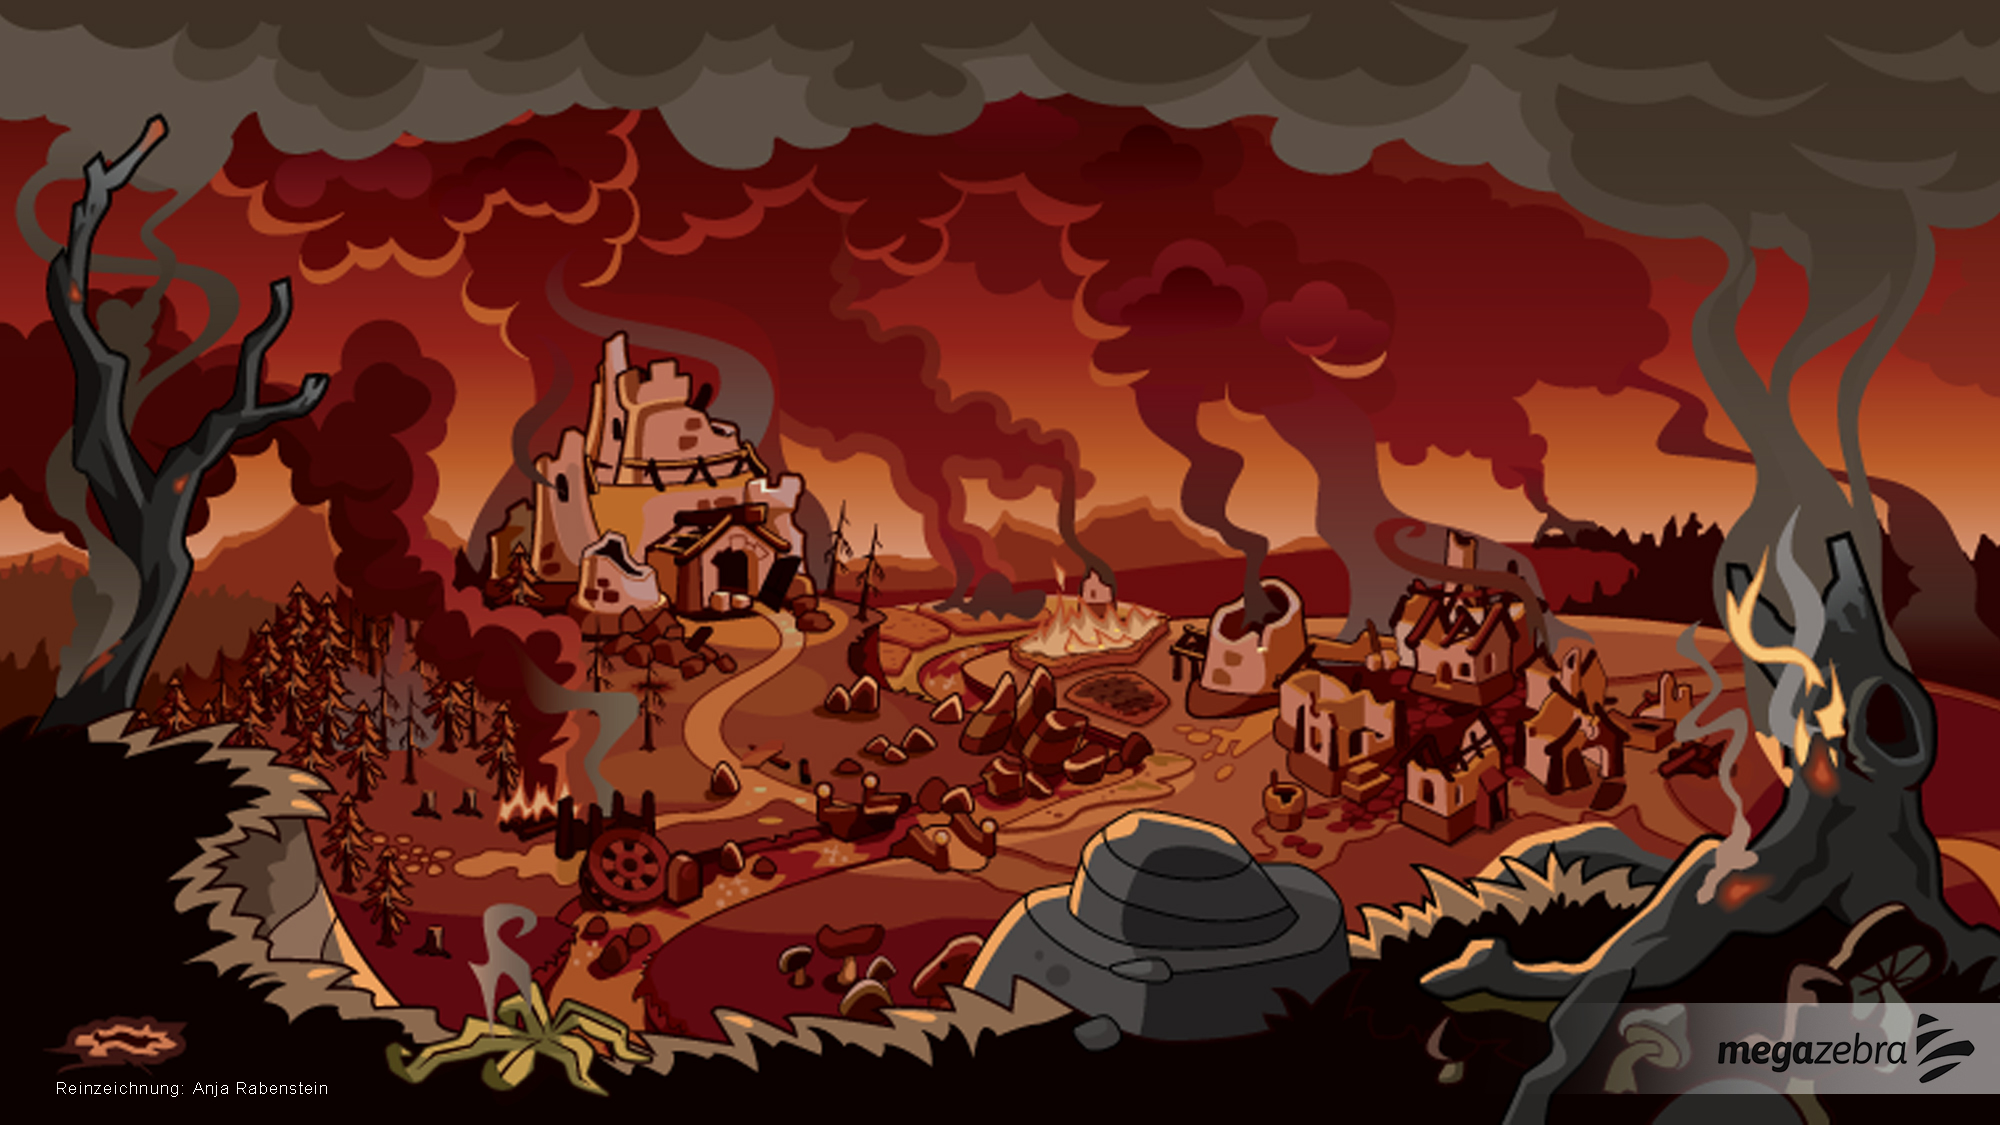 Artwork for a social browser game